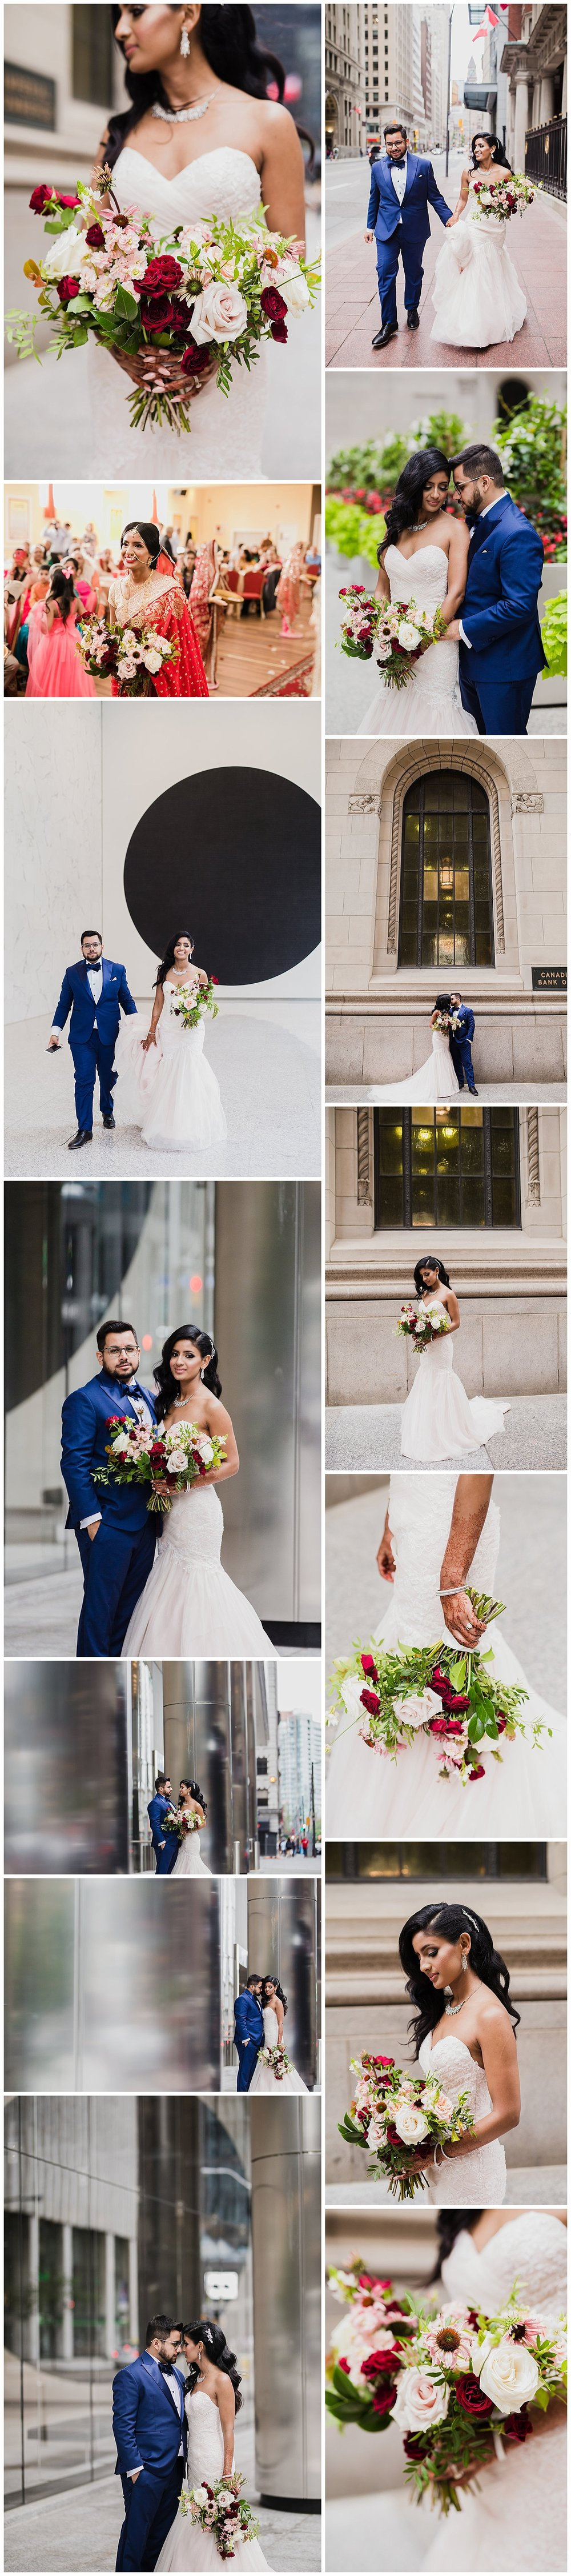 rikki marcone events flowers florist bouquet toronto wedding eglinton grand financial district bridal top best decor burgundy pink